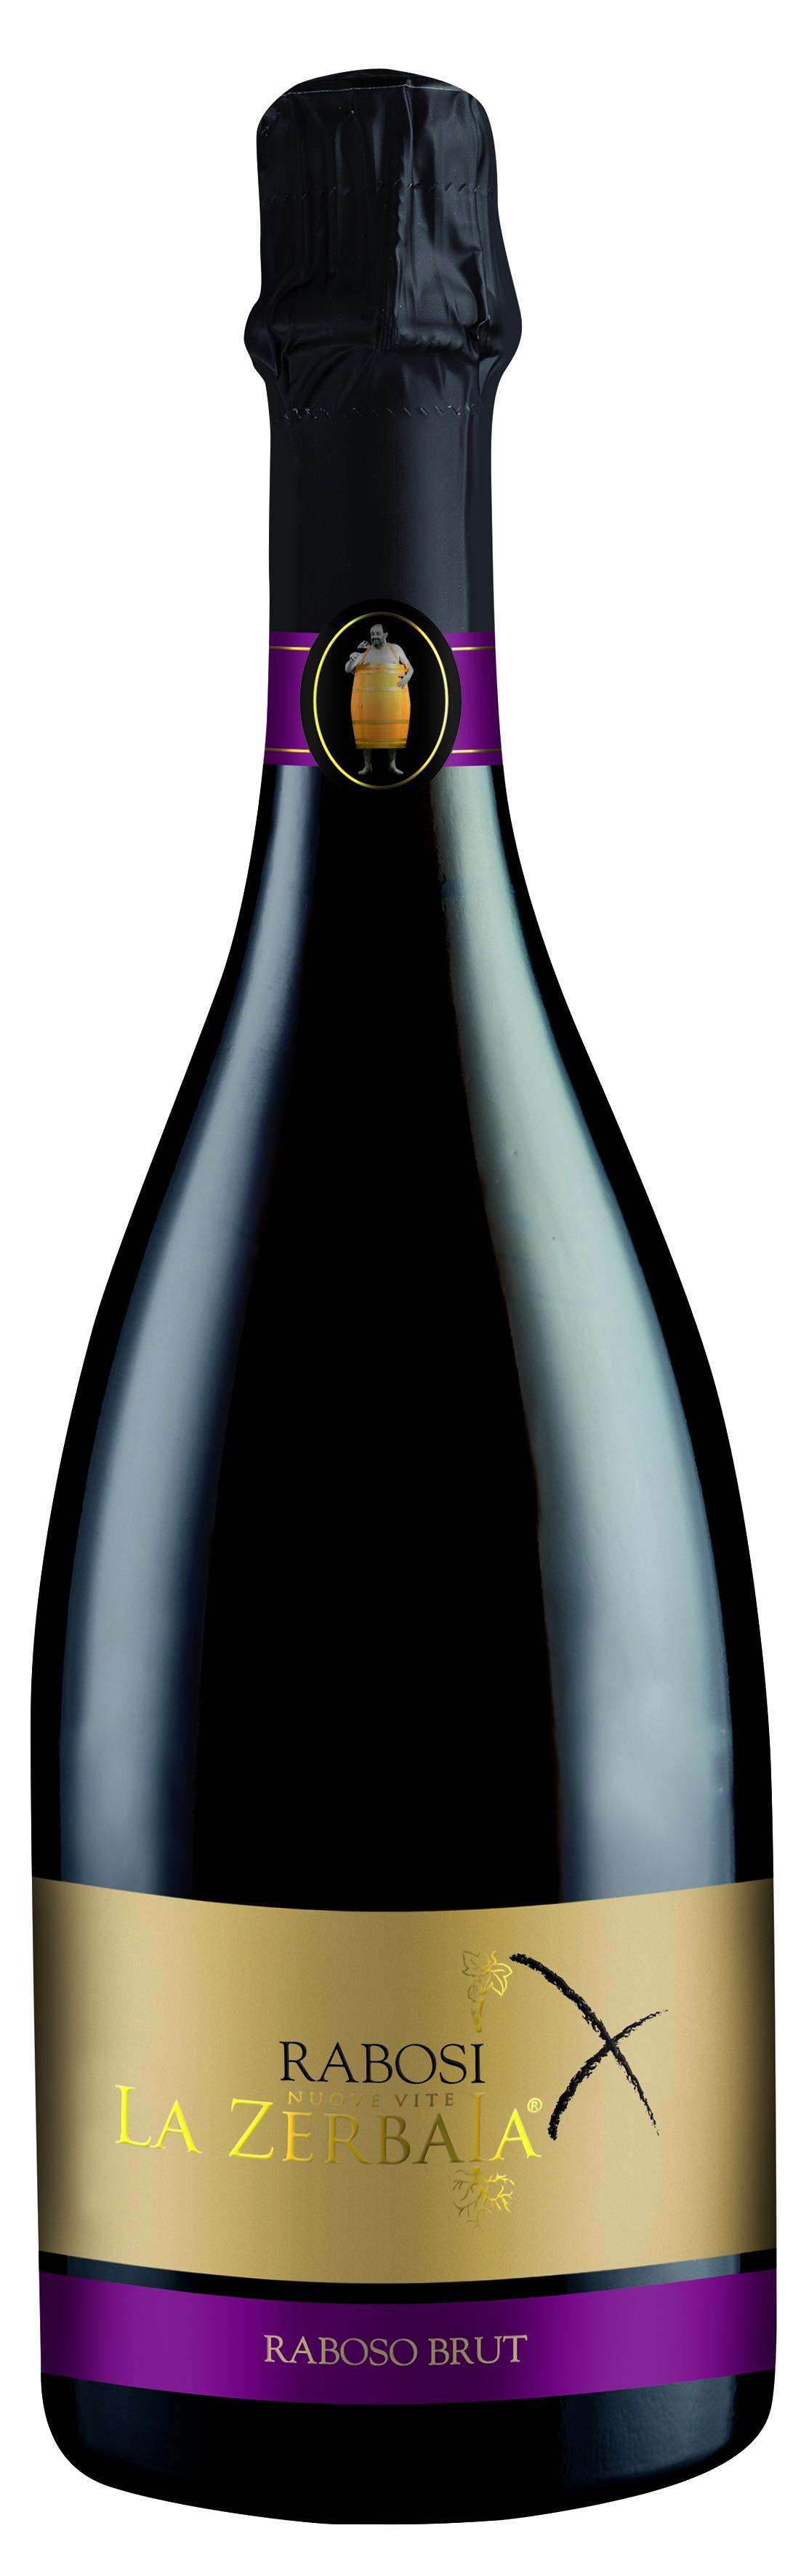 Rabosix - La Zebraia #winelabel #winedesign #Francescon #Collodi #F&C #italianwine